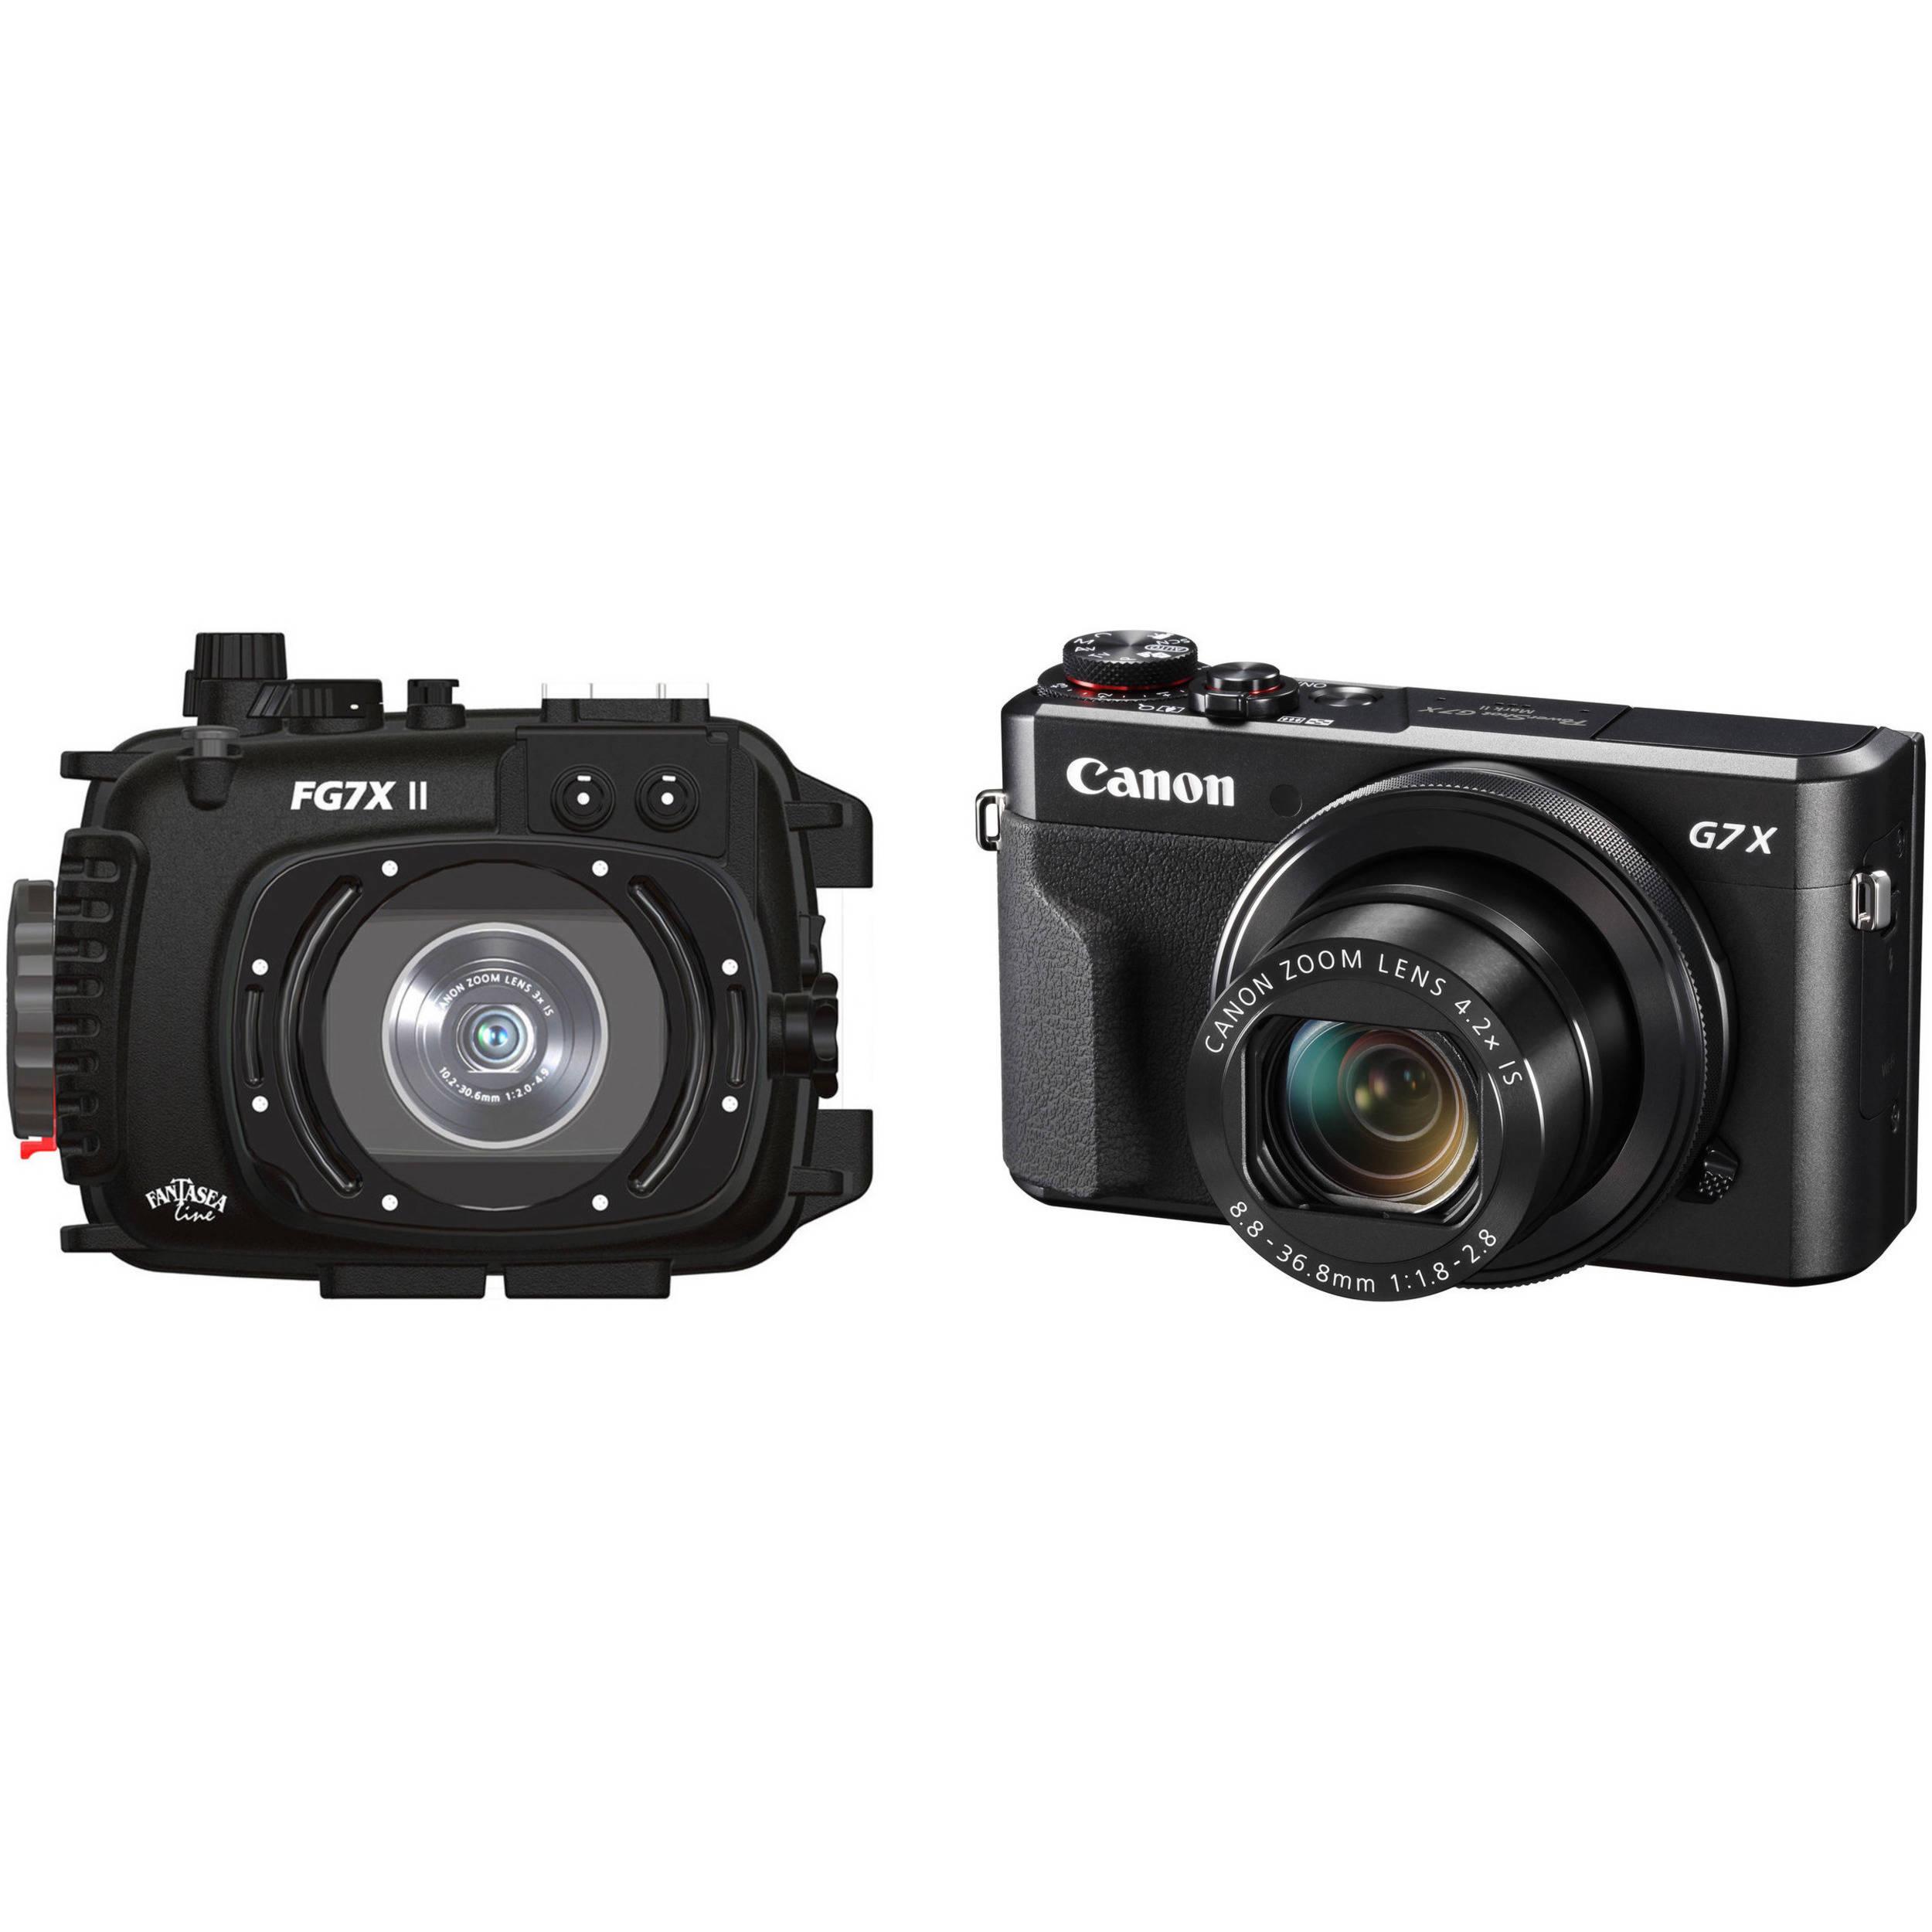 adf8023b6fdb Fantasea Line FG7X II Underwater Housing and Canon PowerShot G7 X Mark II  Camera Kit